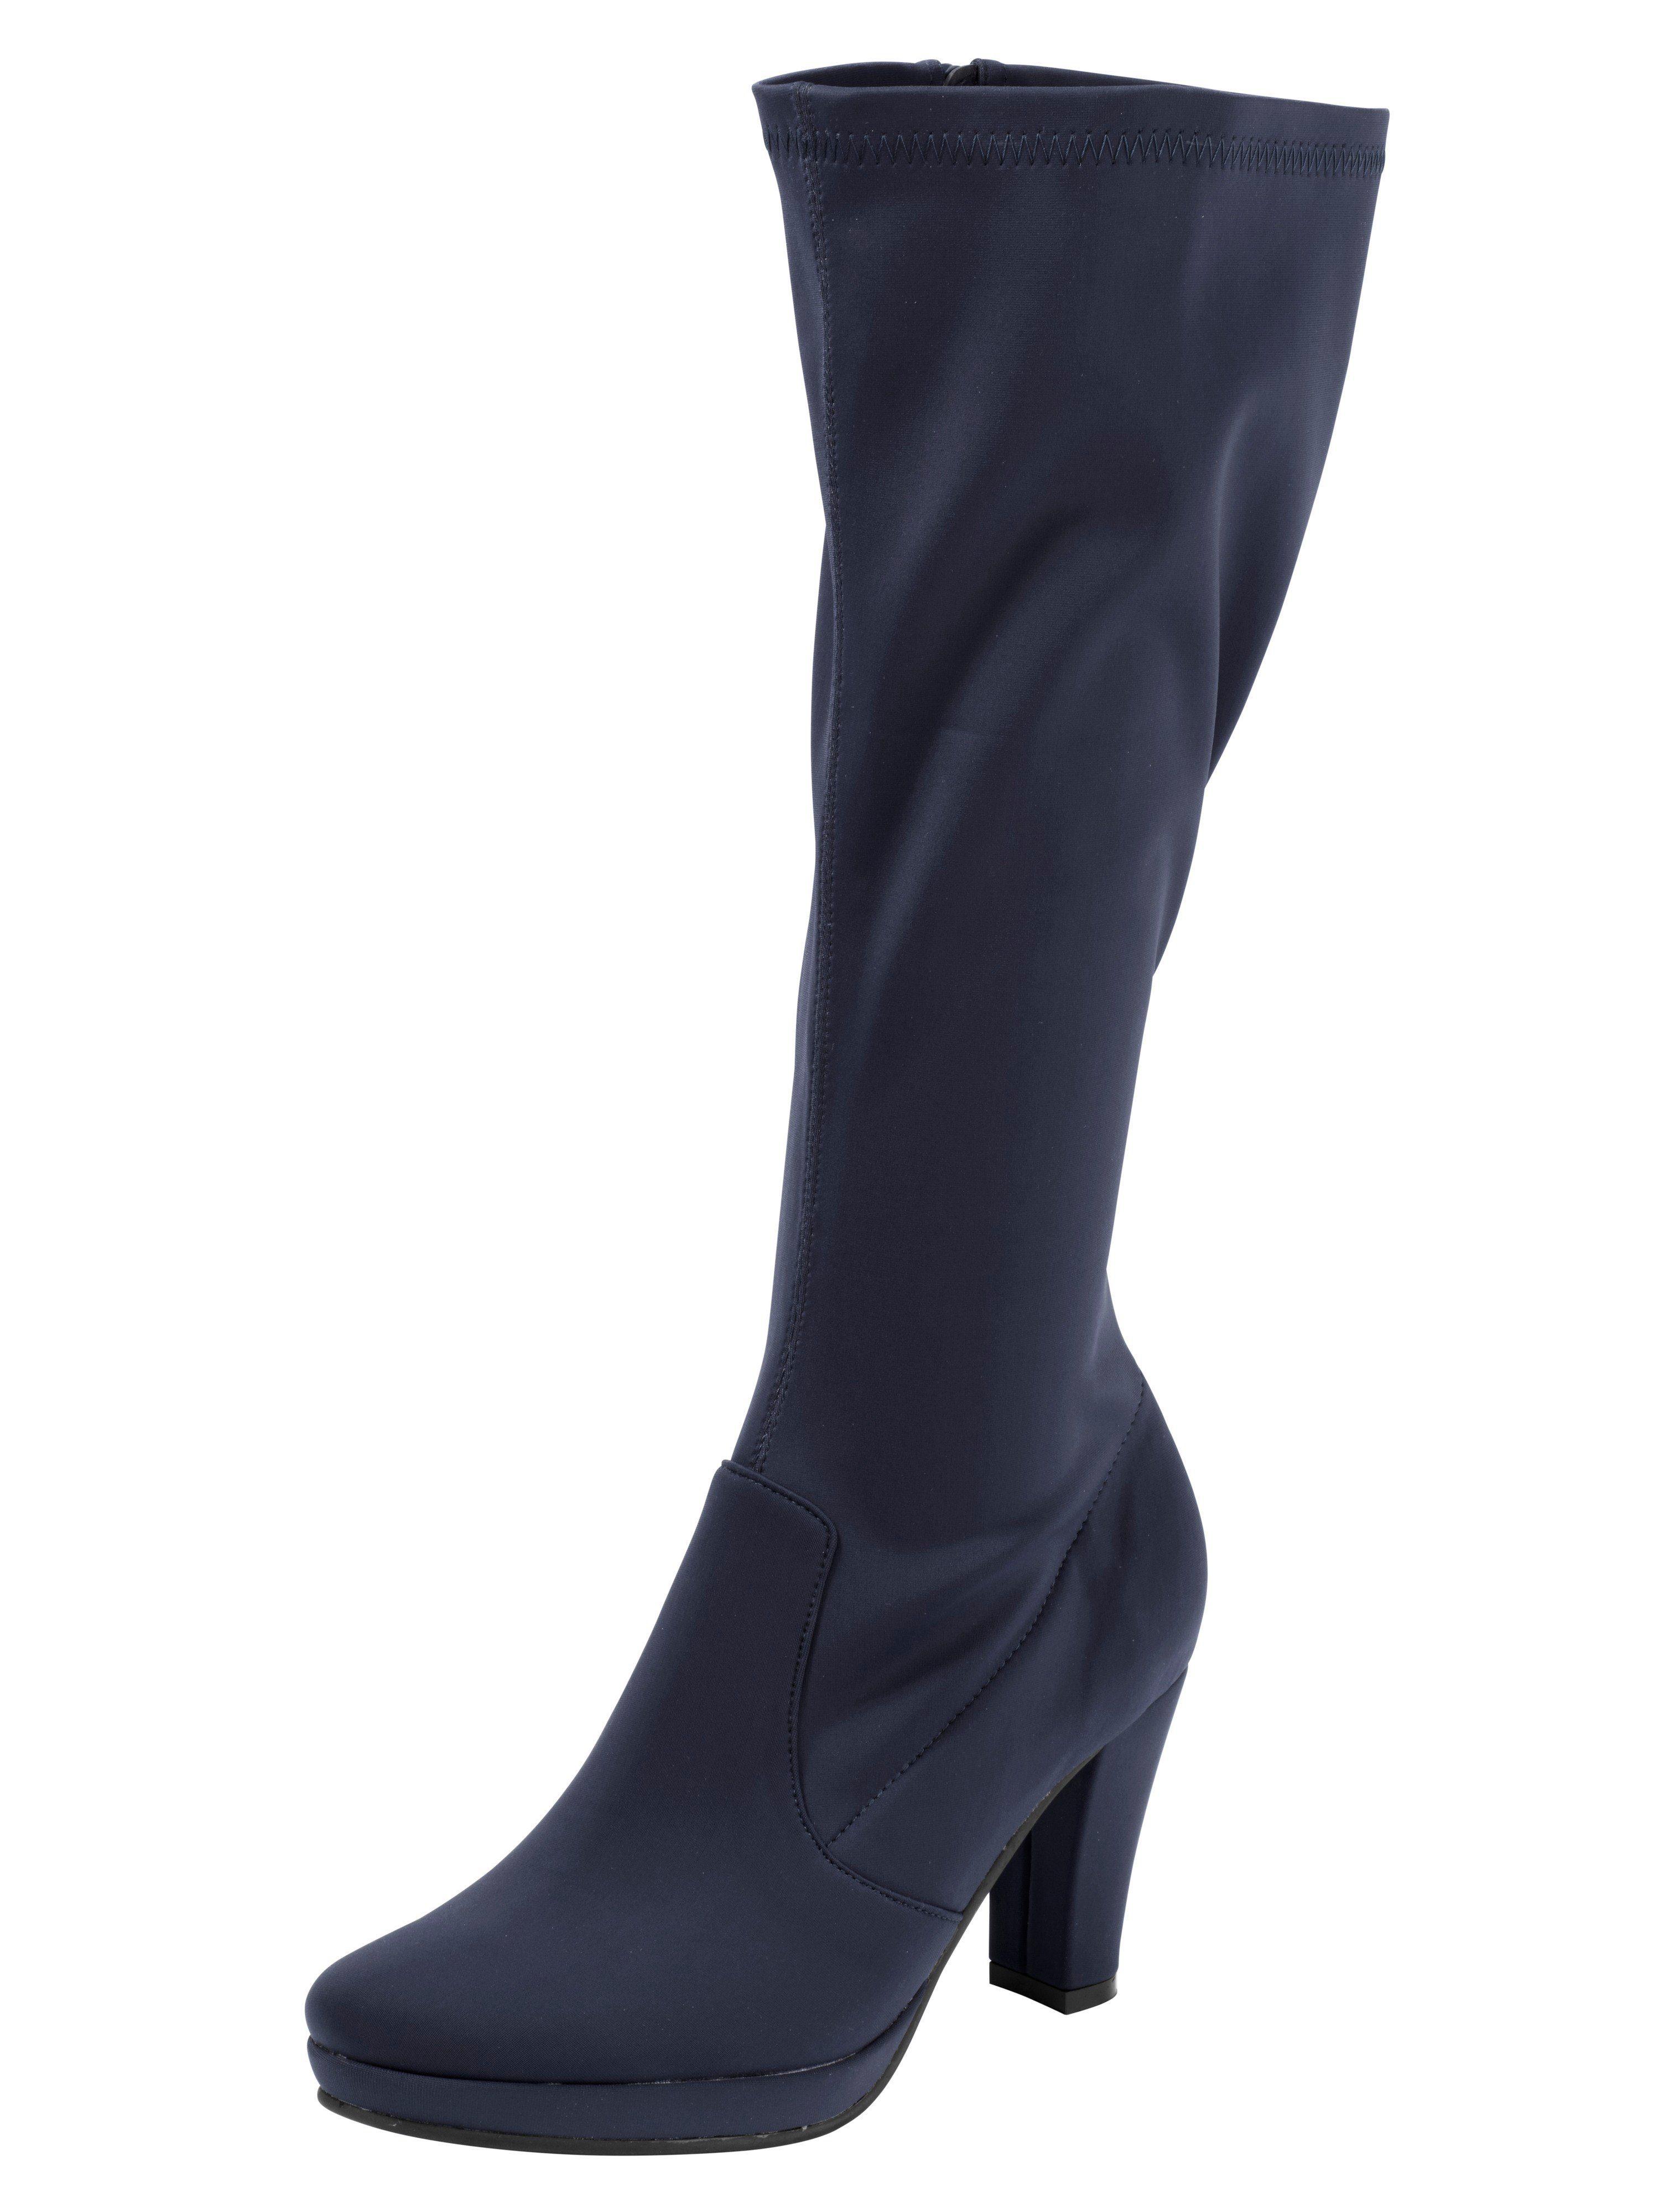 Andrea Conti Stiefel online kaufen  dunkelblau